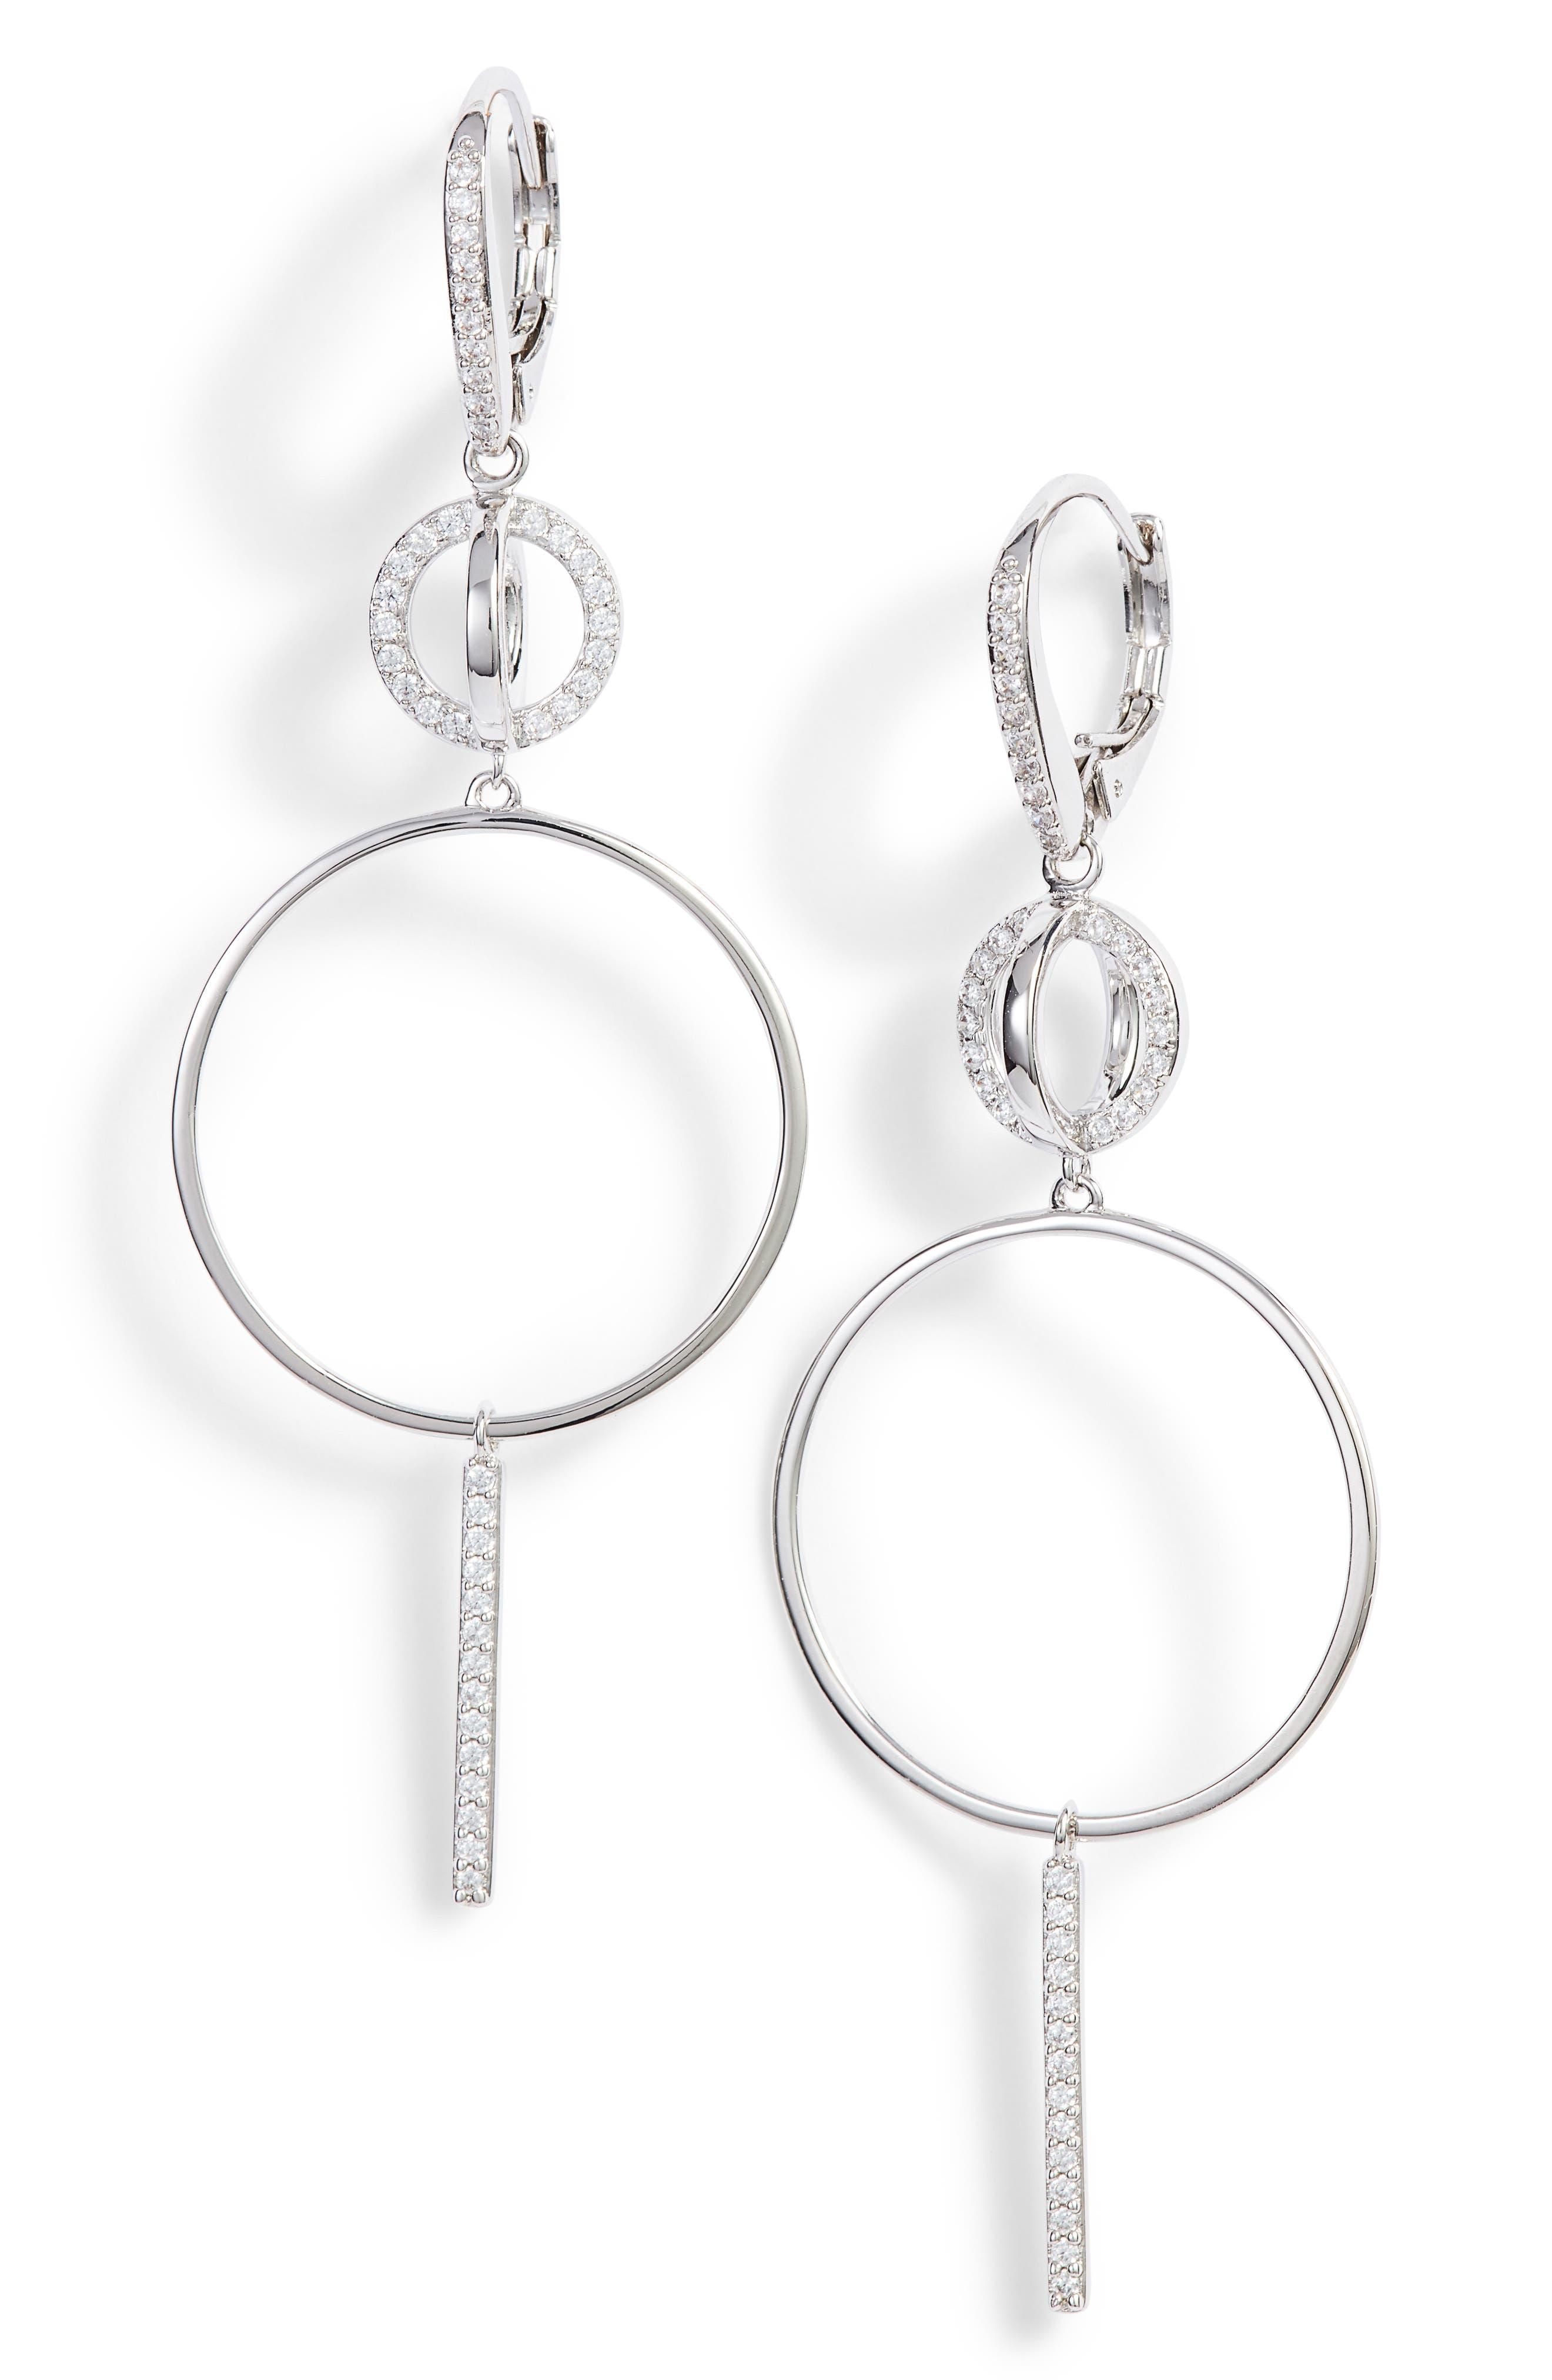 Cubic Zirconia Hoop Drop Earrings,                             Main thumbnail 1, color,                             040